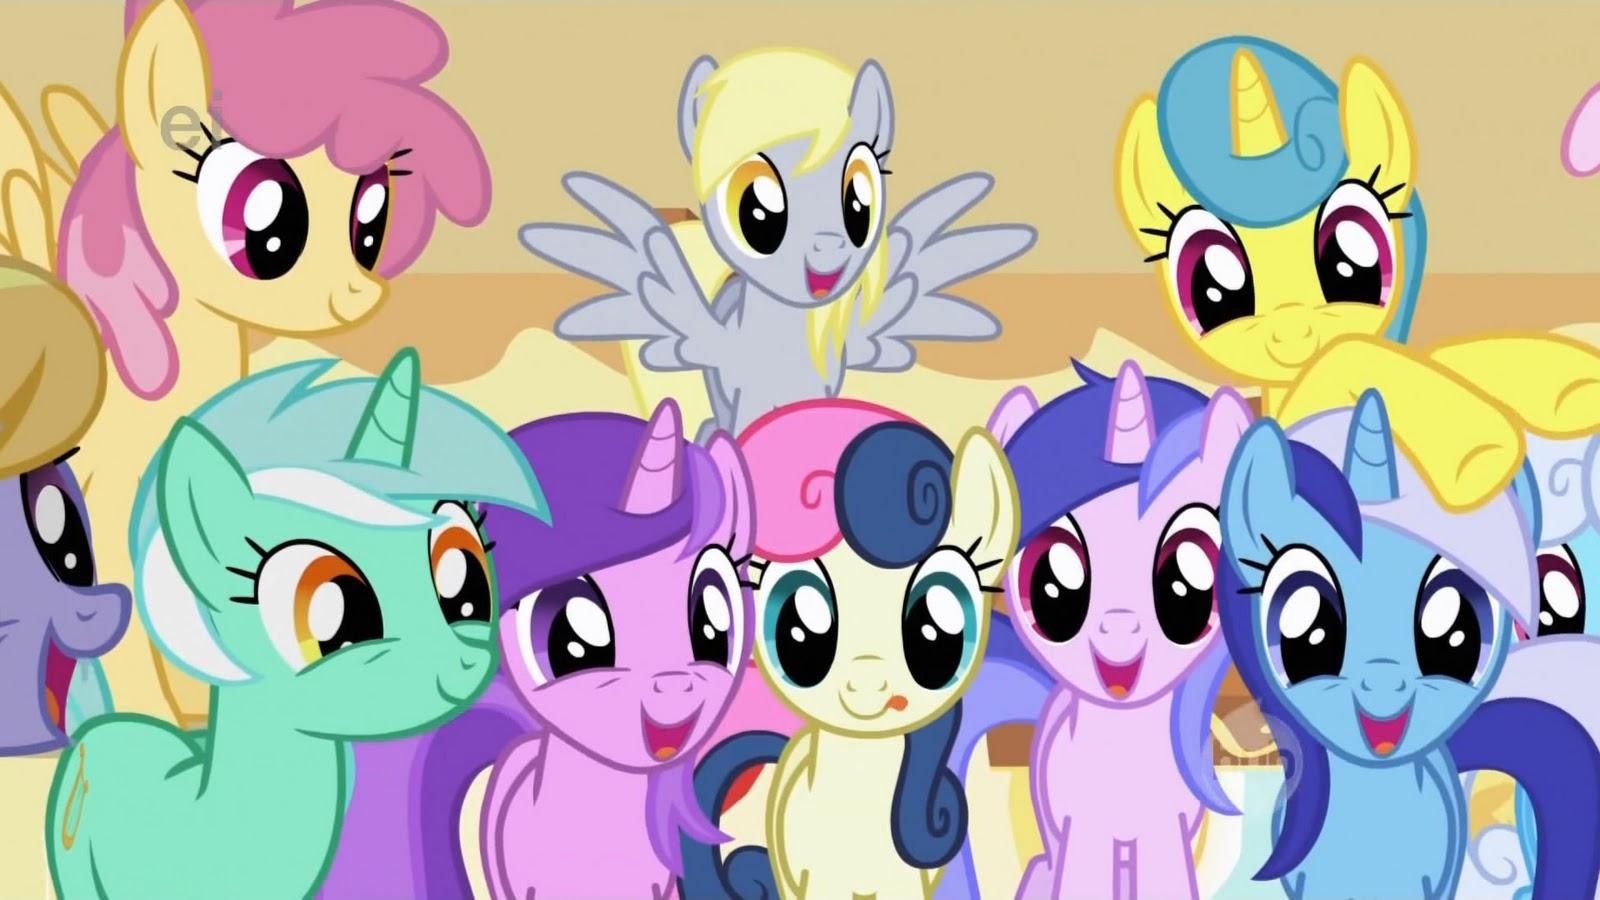 my little pony friendship is magic season 1 download free